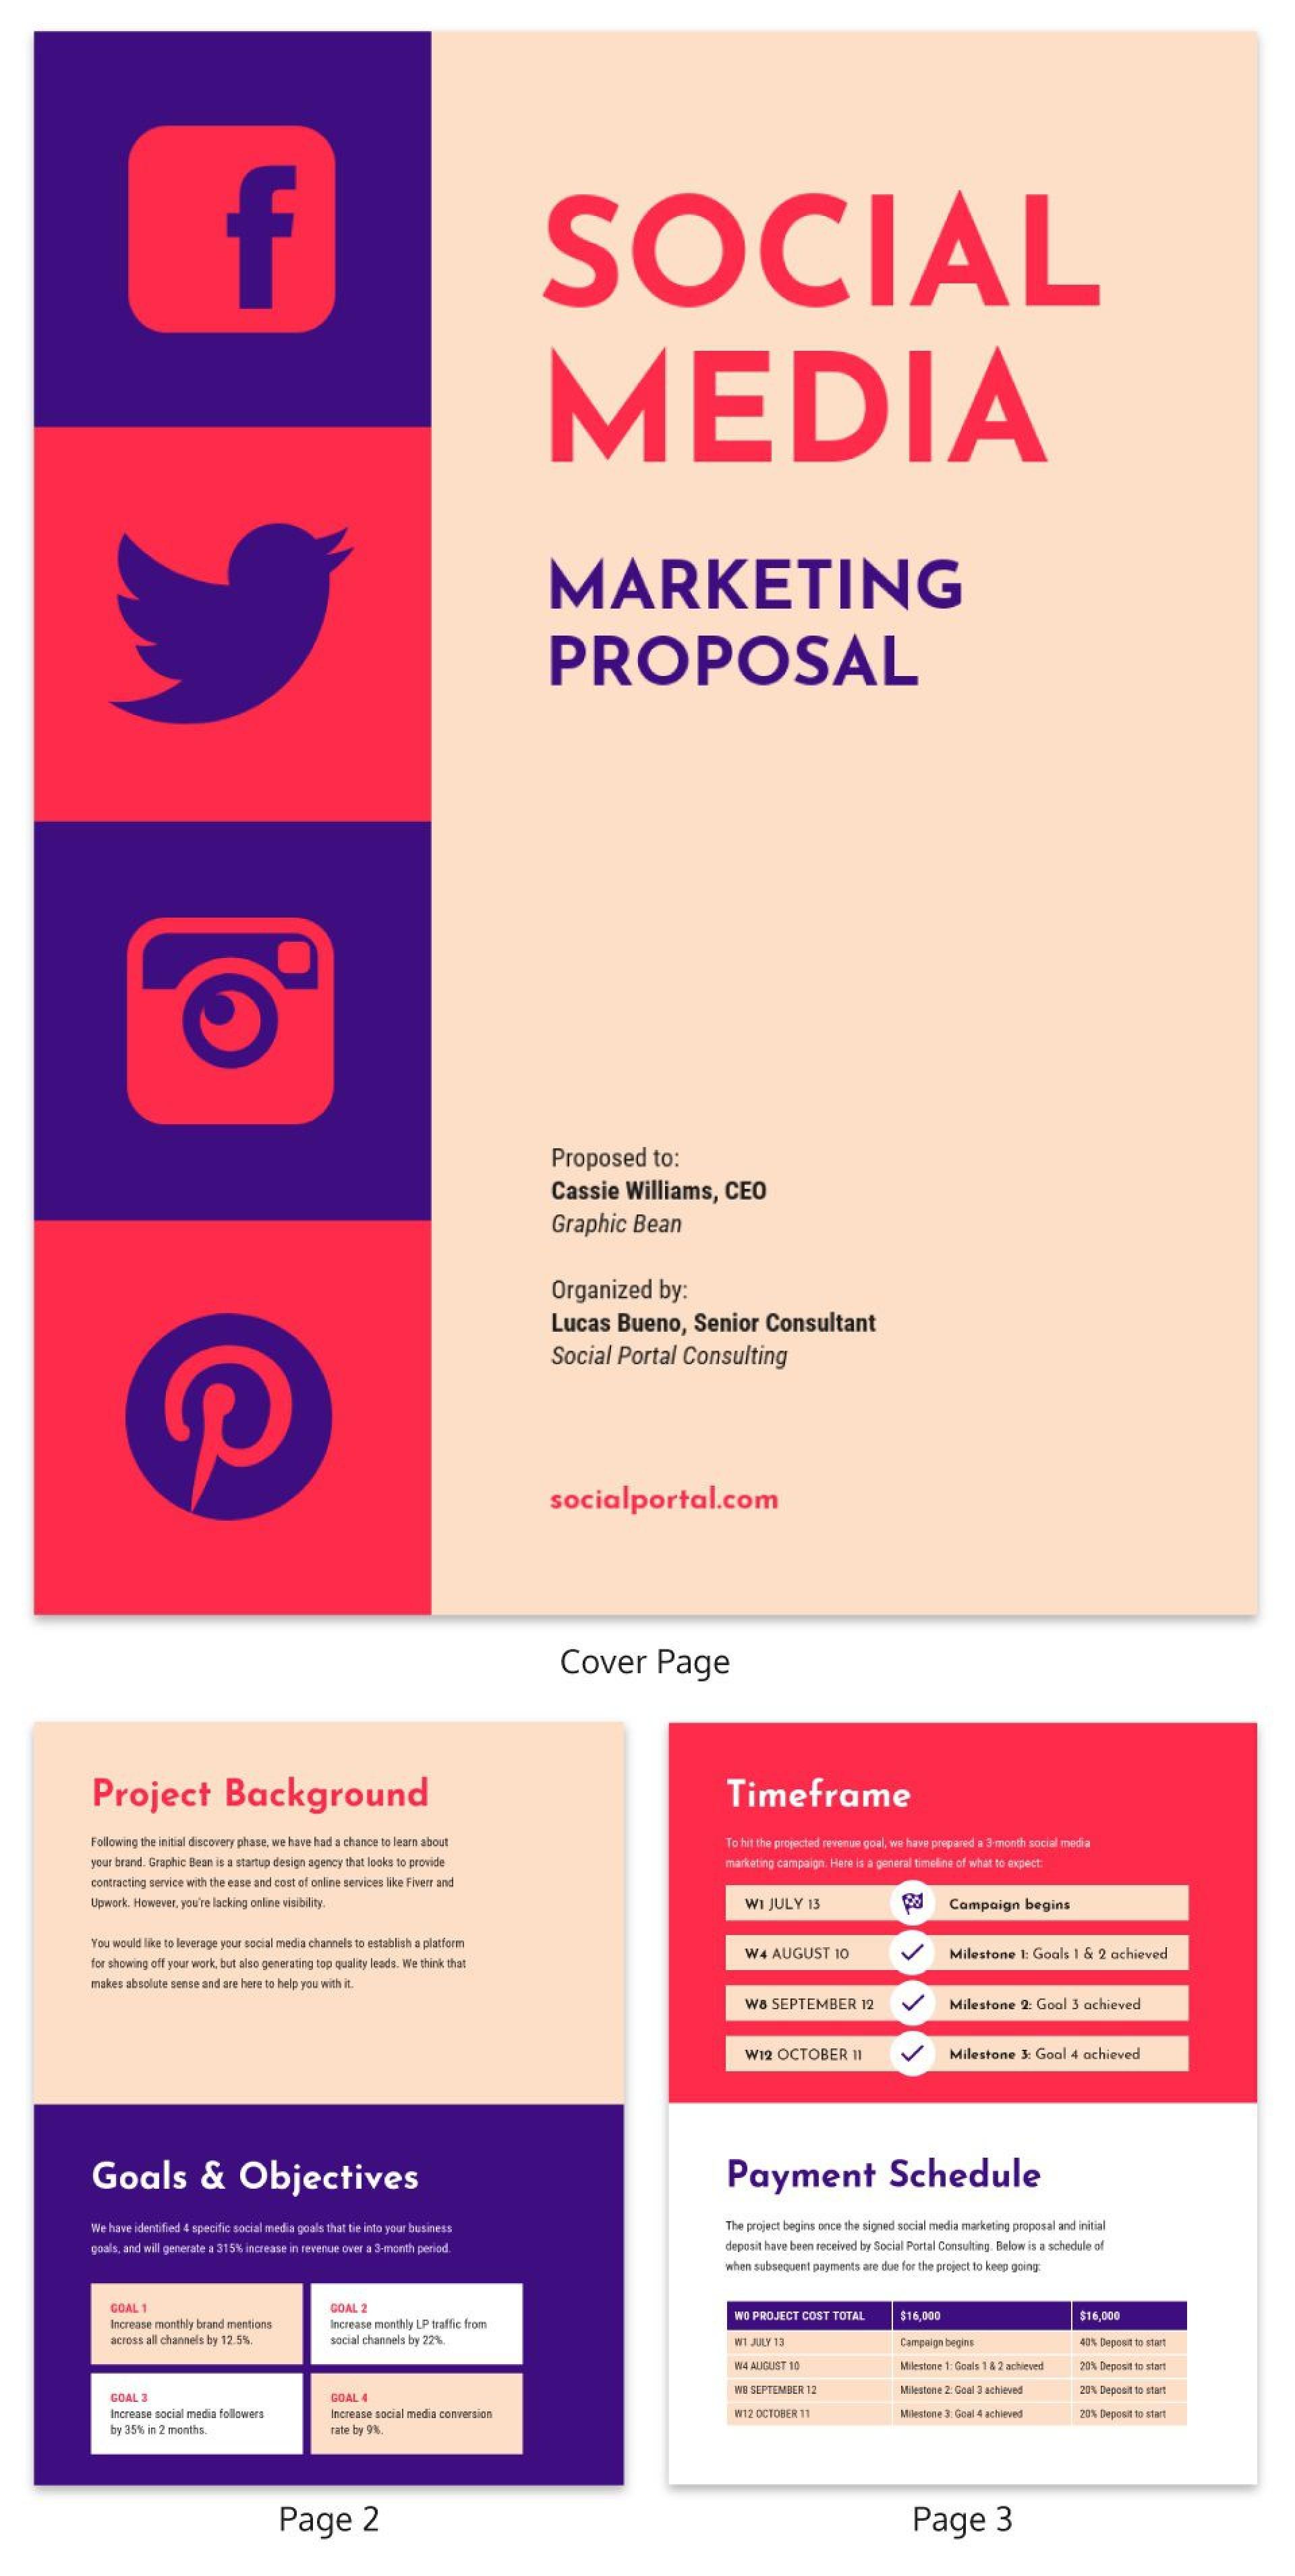 006 Wonderful Social Media Proposal Template Idea  Ppt Marketing Word 20191920